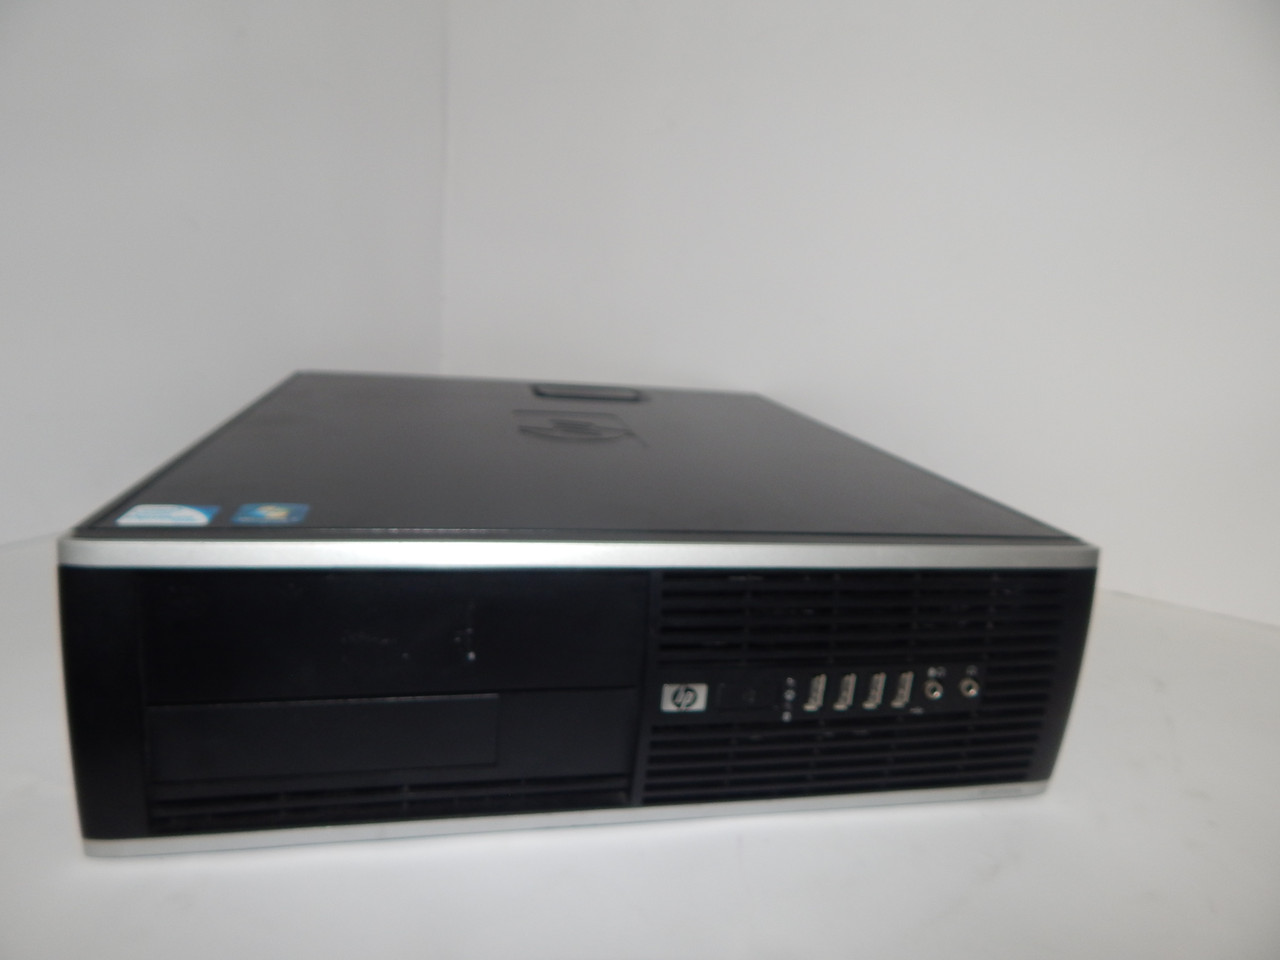 Системный блок HP 6000 Intel core 2 duo RAM 2 ГБ DDR3 опт розница